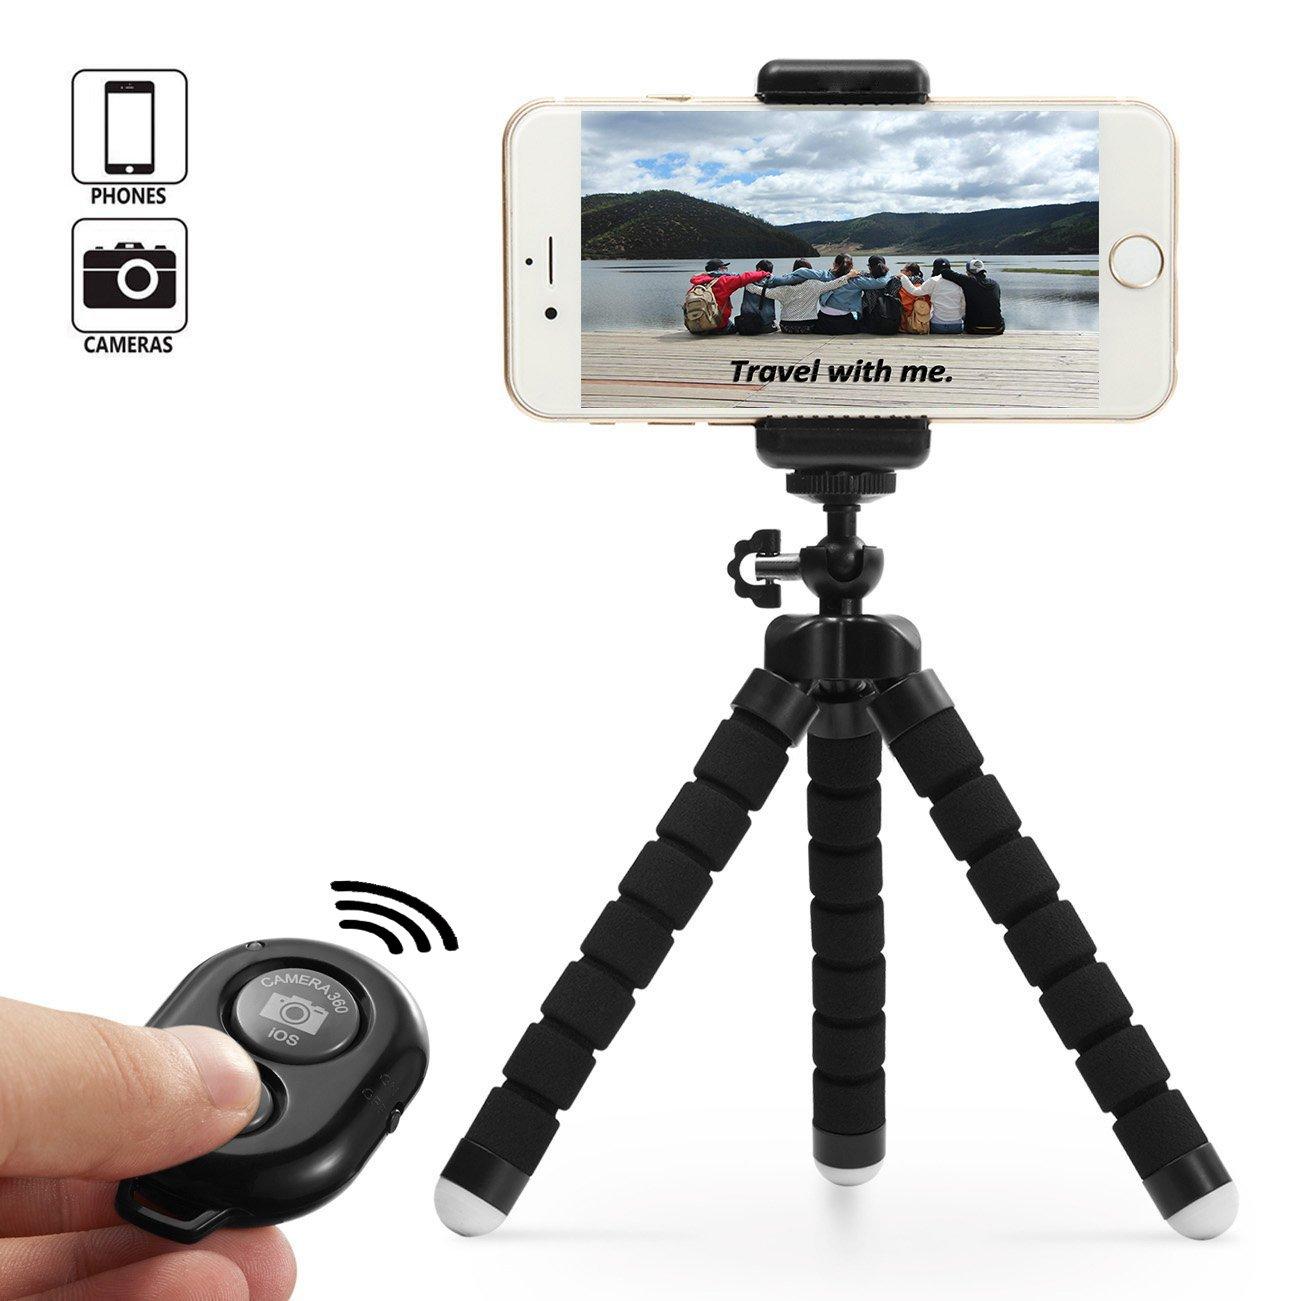 Dezuo cm Mini Trípode para Móvil Smartphone Cámara Digital iPhone ipad Incluye